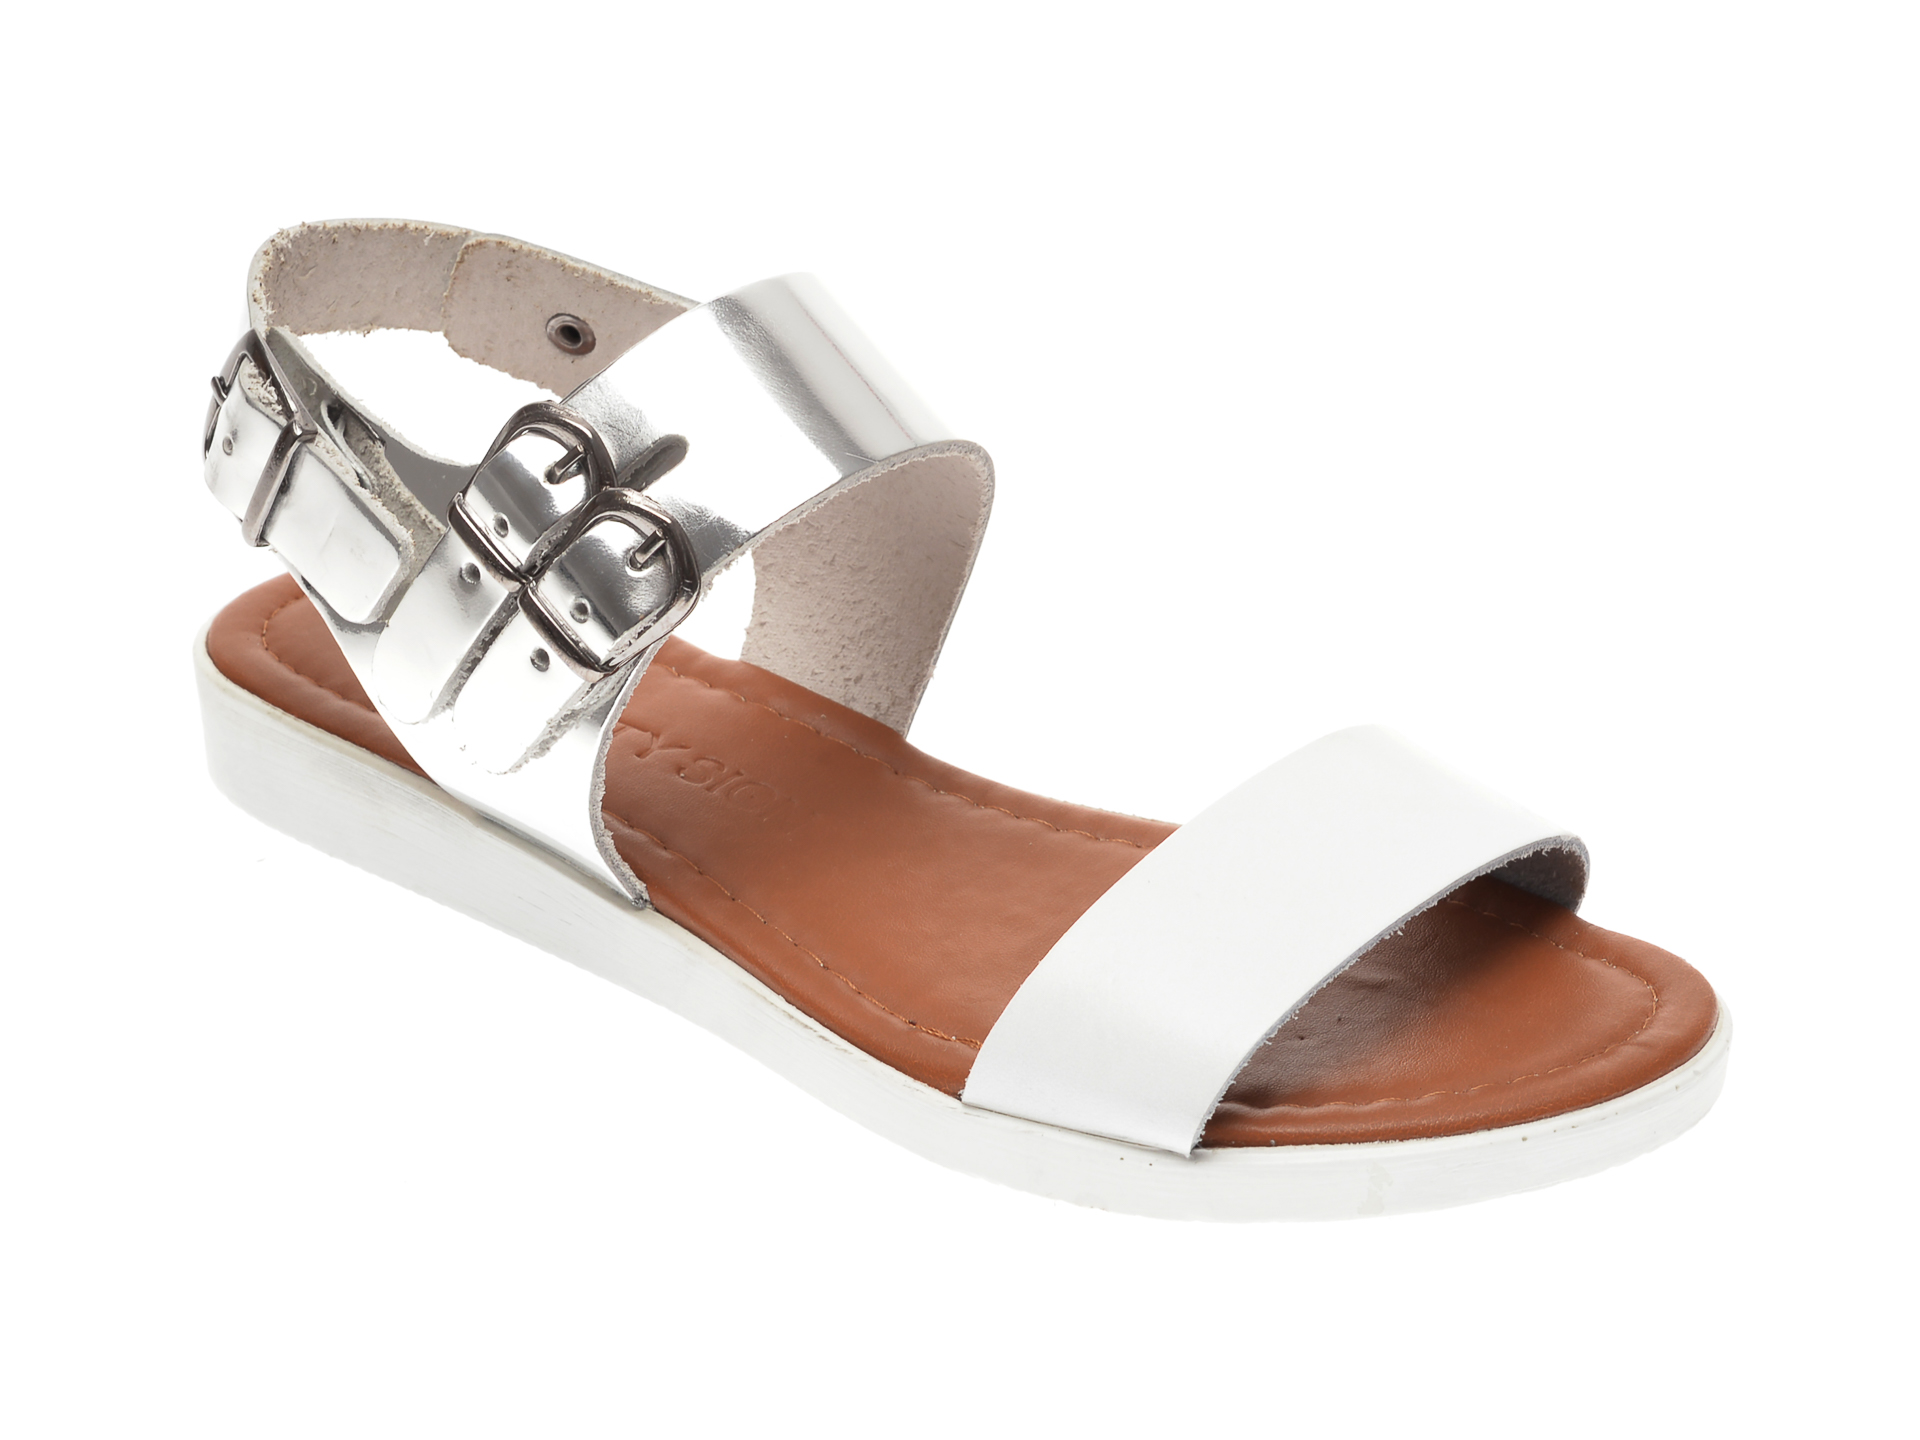 Sandale CITY SIGN albe, 01, din piele naturala New